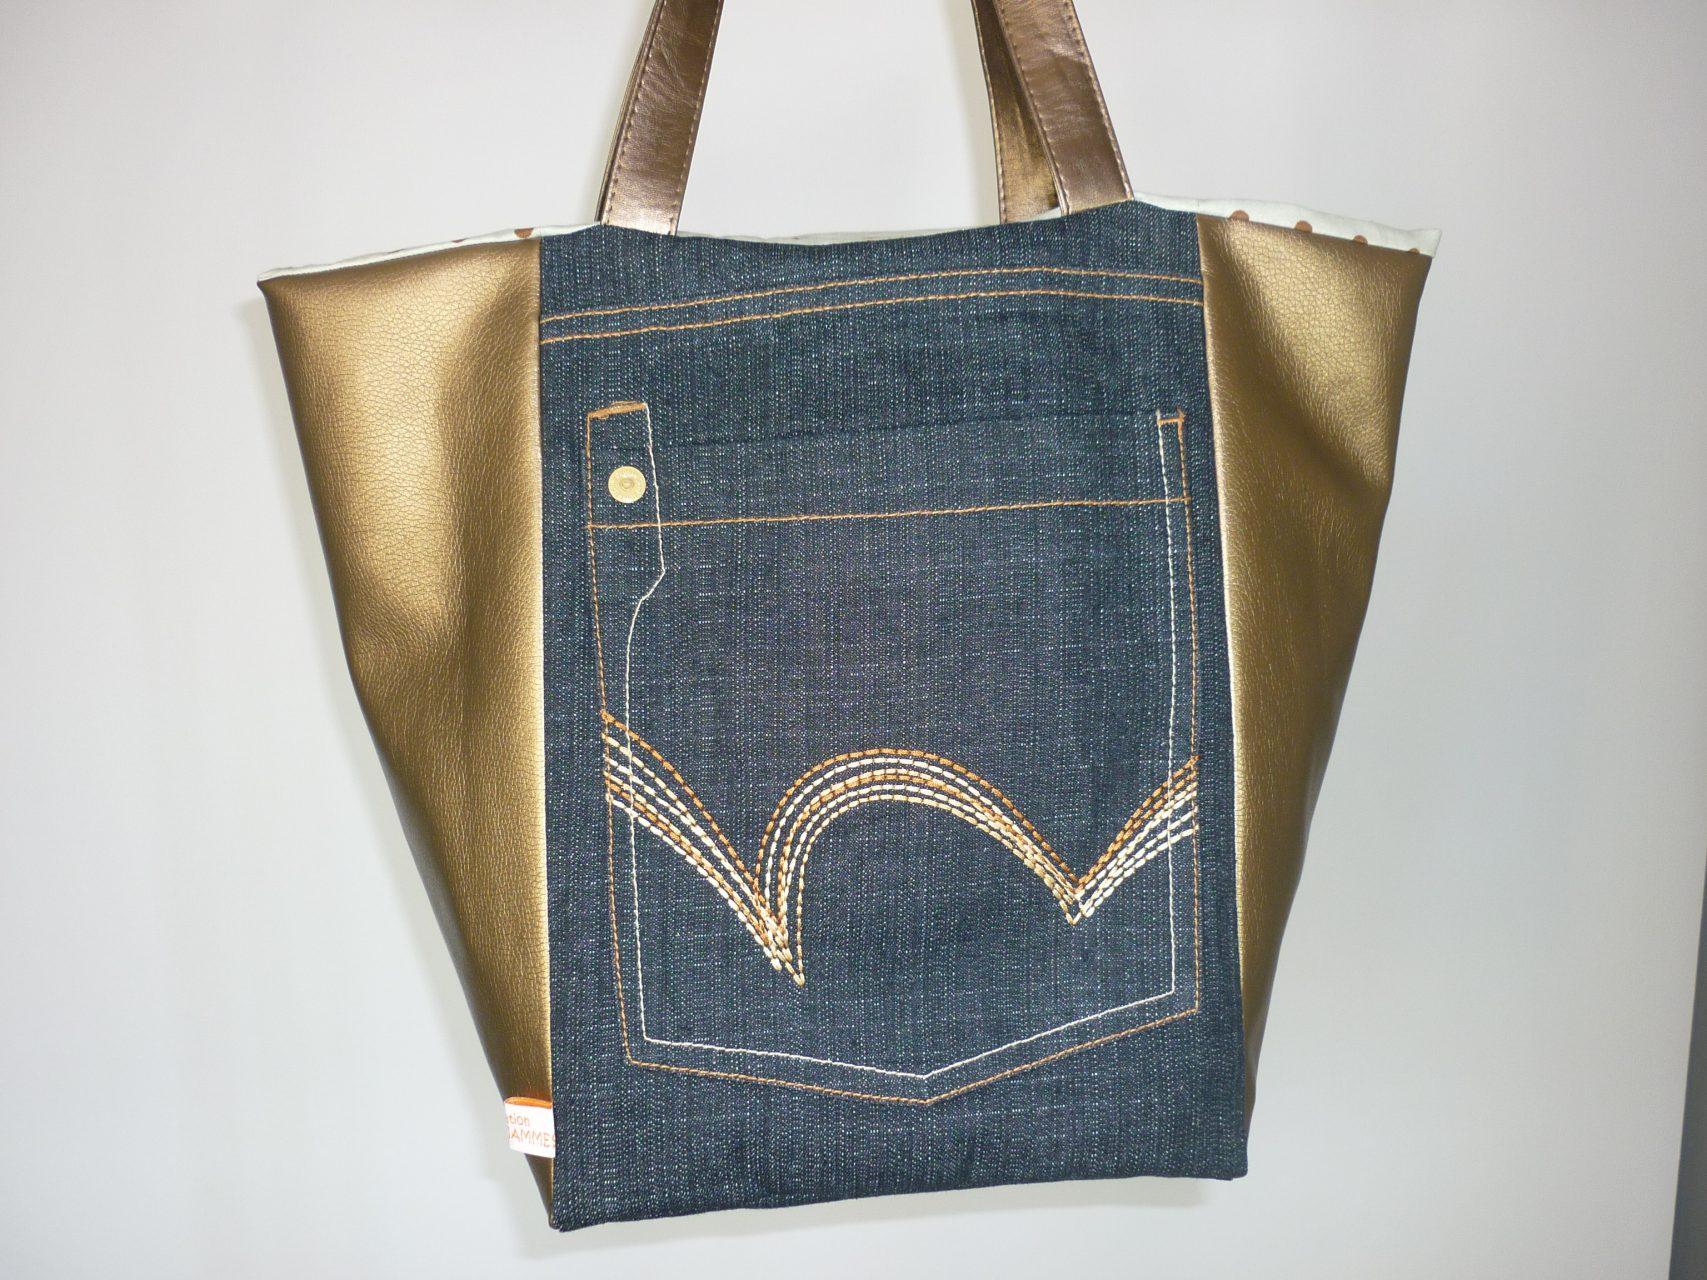 design intemporel 84dac 729c0 Sac cabas marron et jean recyclé